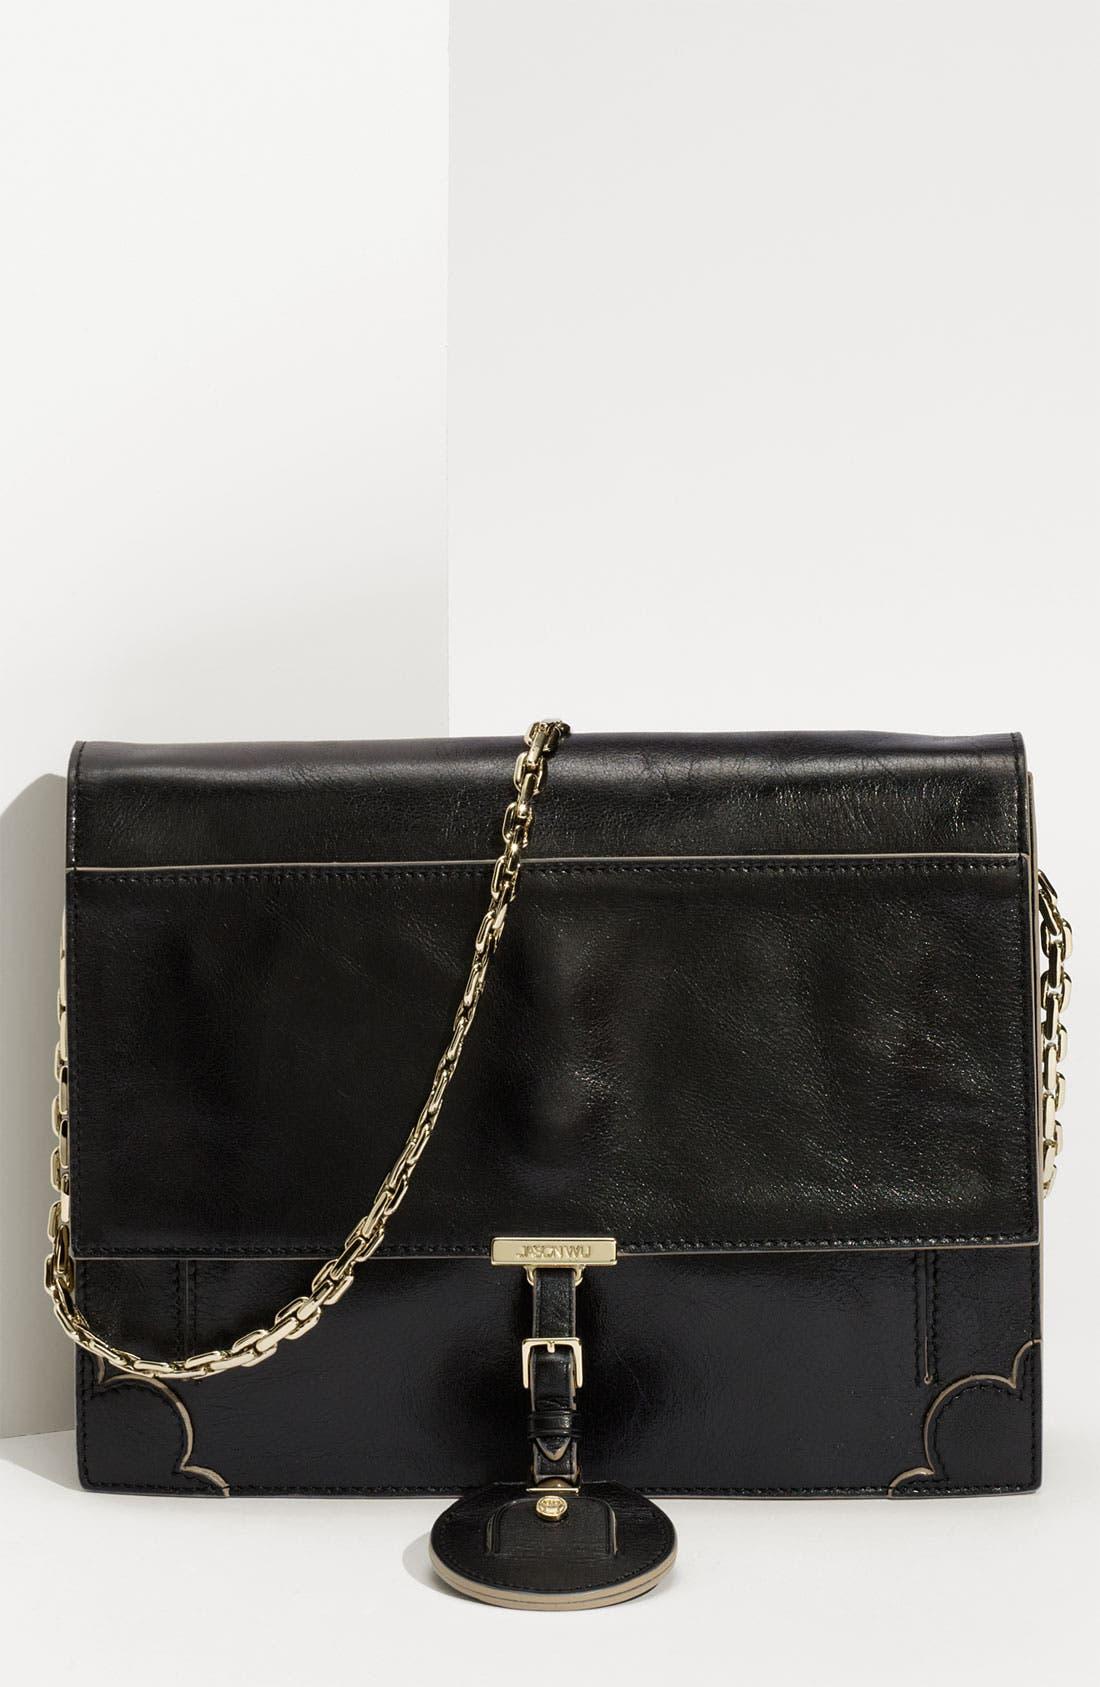 Alternate Image 1 Selected - Jason Wu 'Jourdan' Calfskin Leather Shoulder Bag